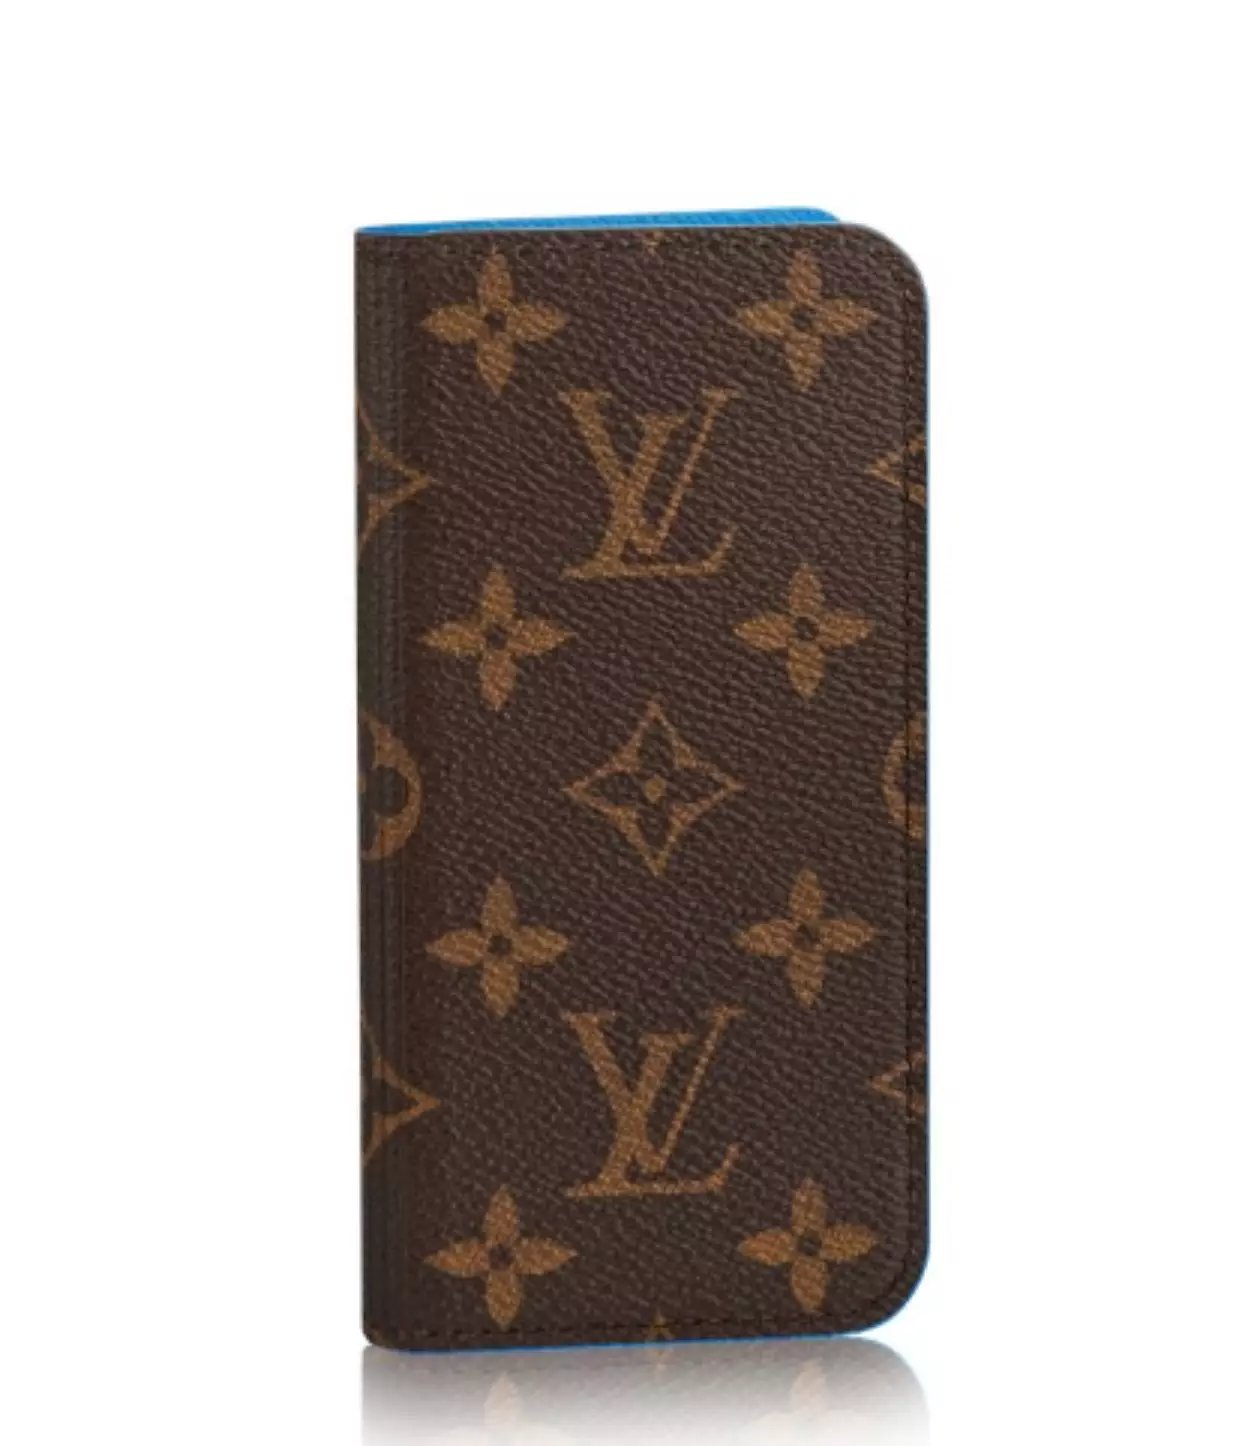 iphone case mit foto iphone lederhülle Louis Vuitton iphone 8 Plus hüllen glitzer hülle iphone 8 Plus spezielle iphone hüllen iphone 8 Plus hülle silikon iphone silikon ca8 Plus apple tasche handyhüllen 8 Pluslbst gestalten mit eigenen bildern